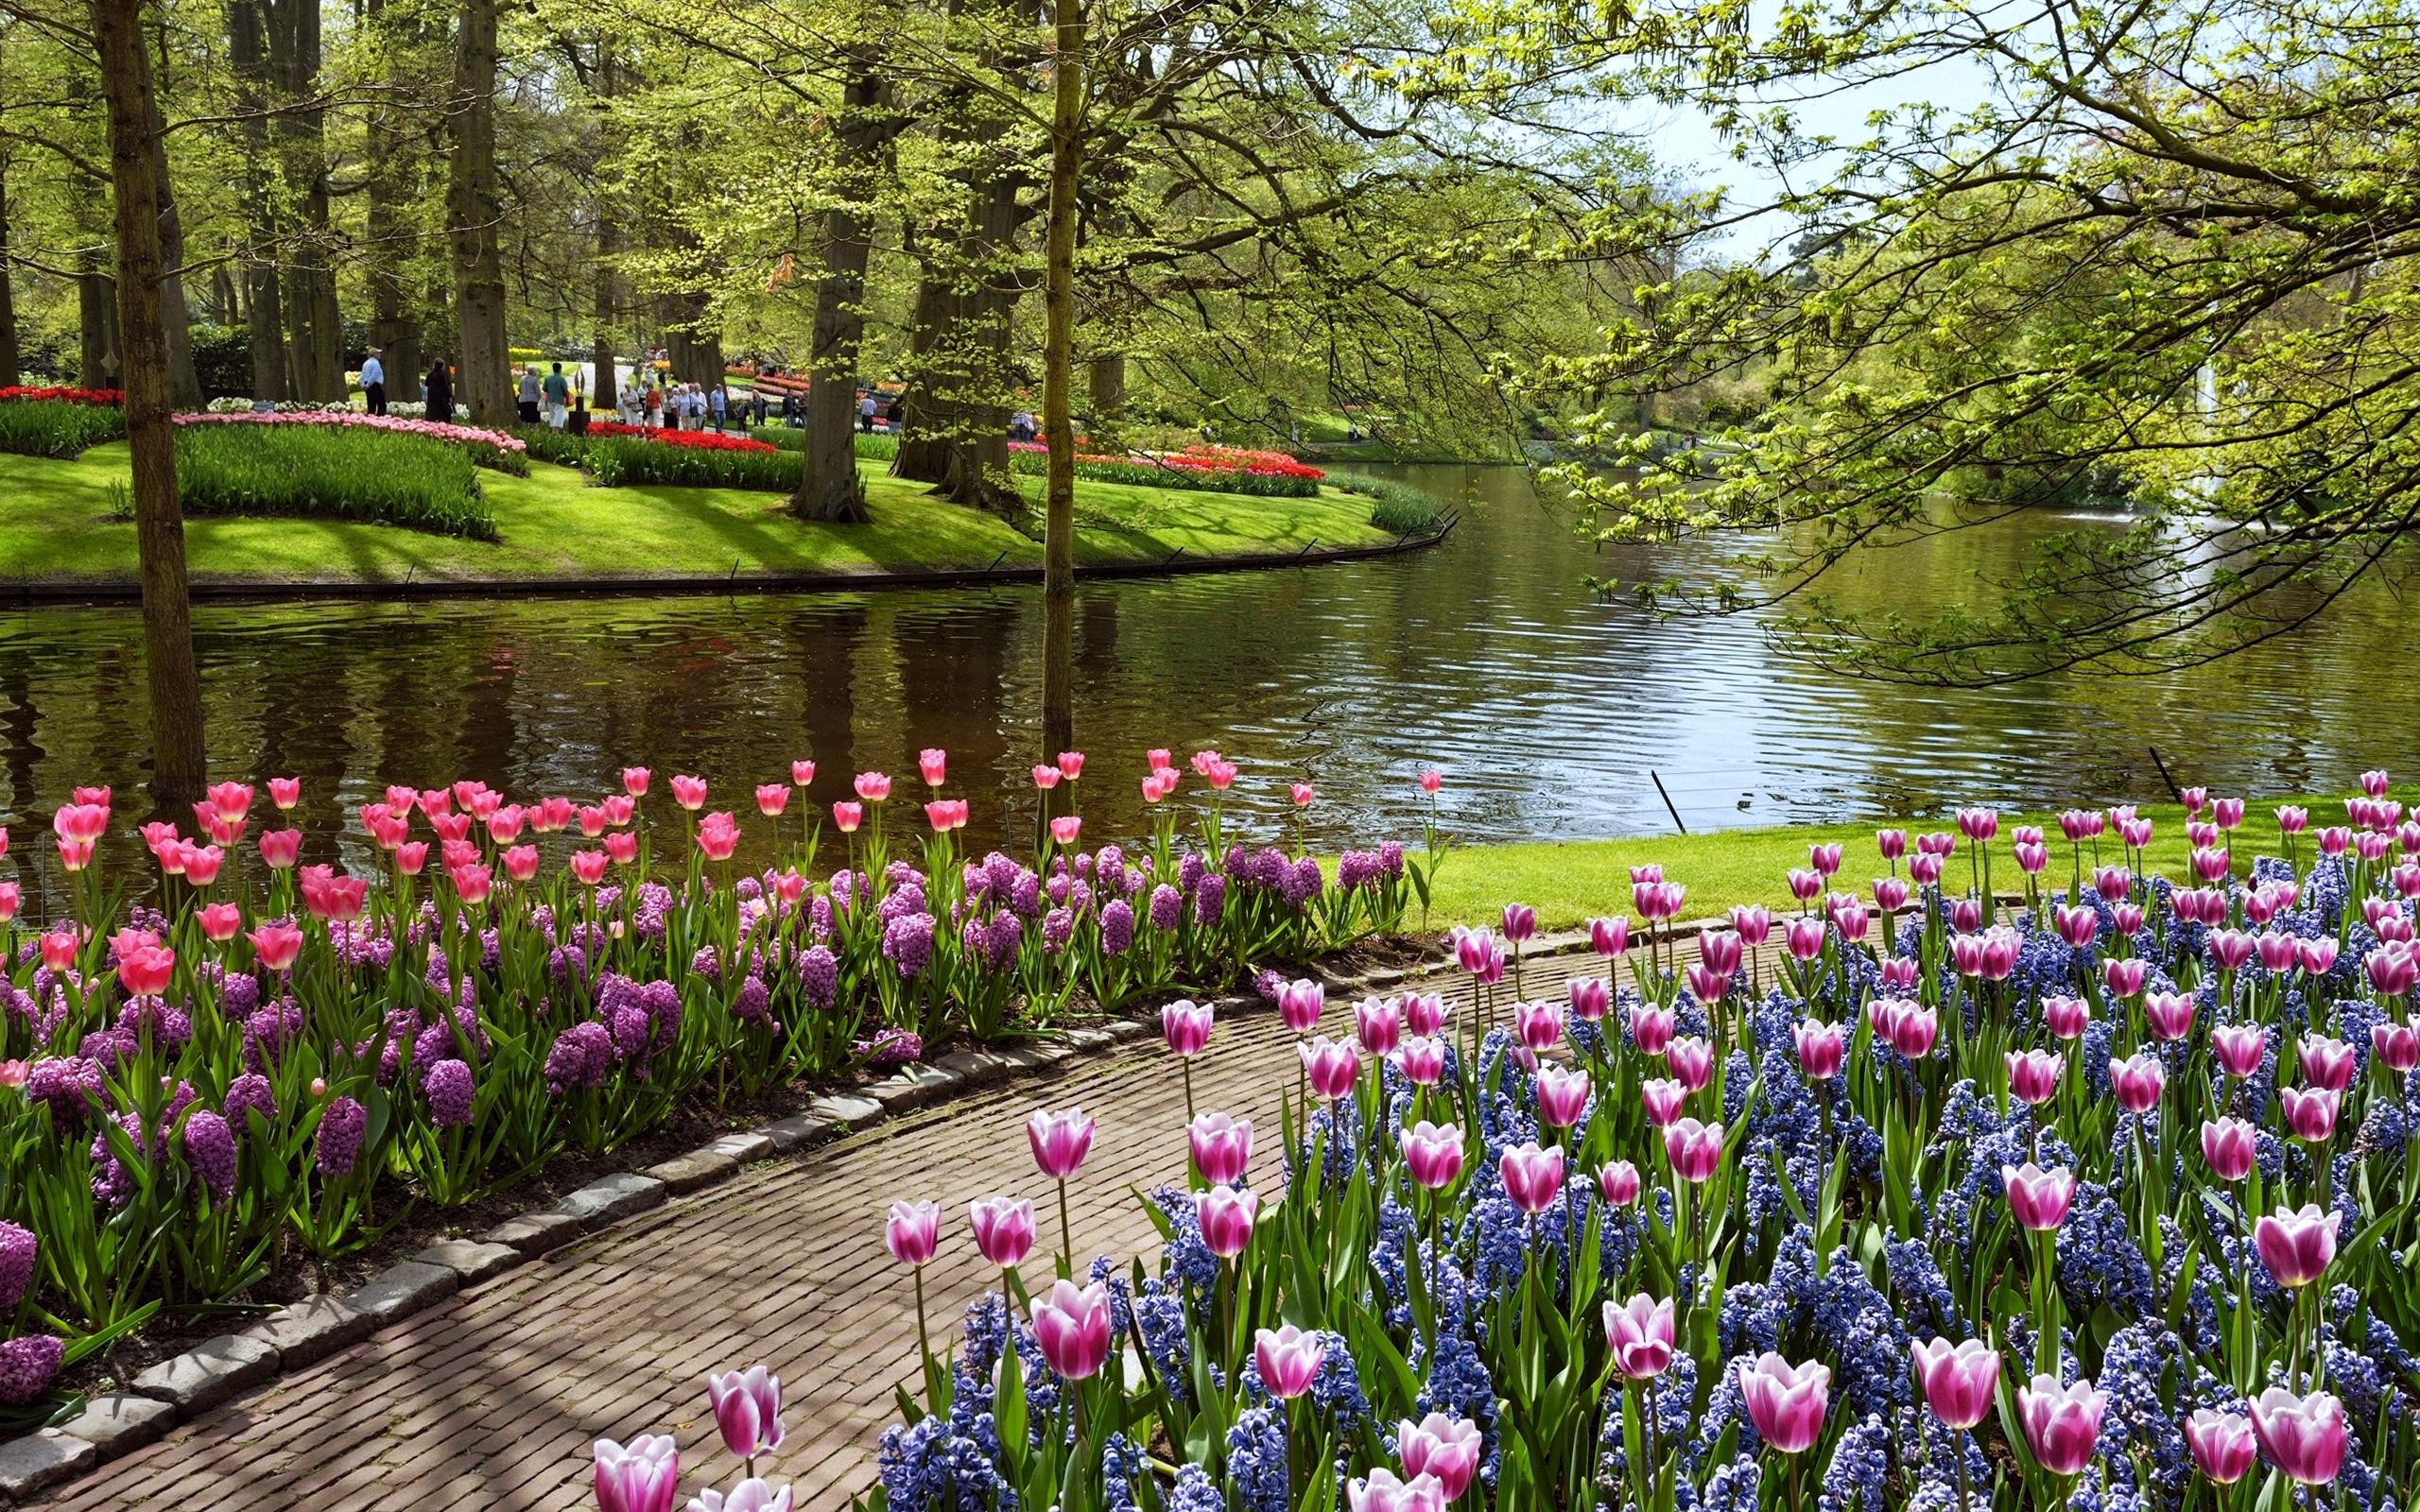 Beautiful Summer Garden Wallpapers HD Desktop and Mobile Backgrounds 2560x1600